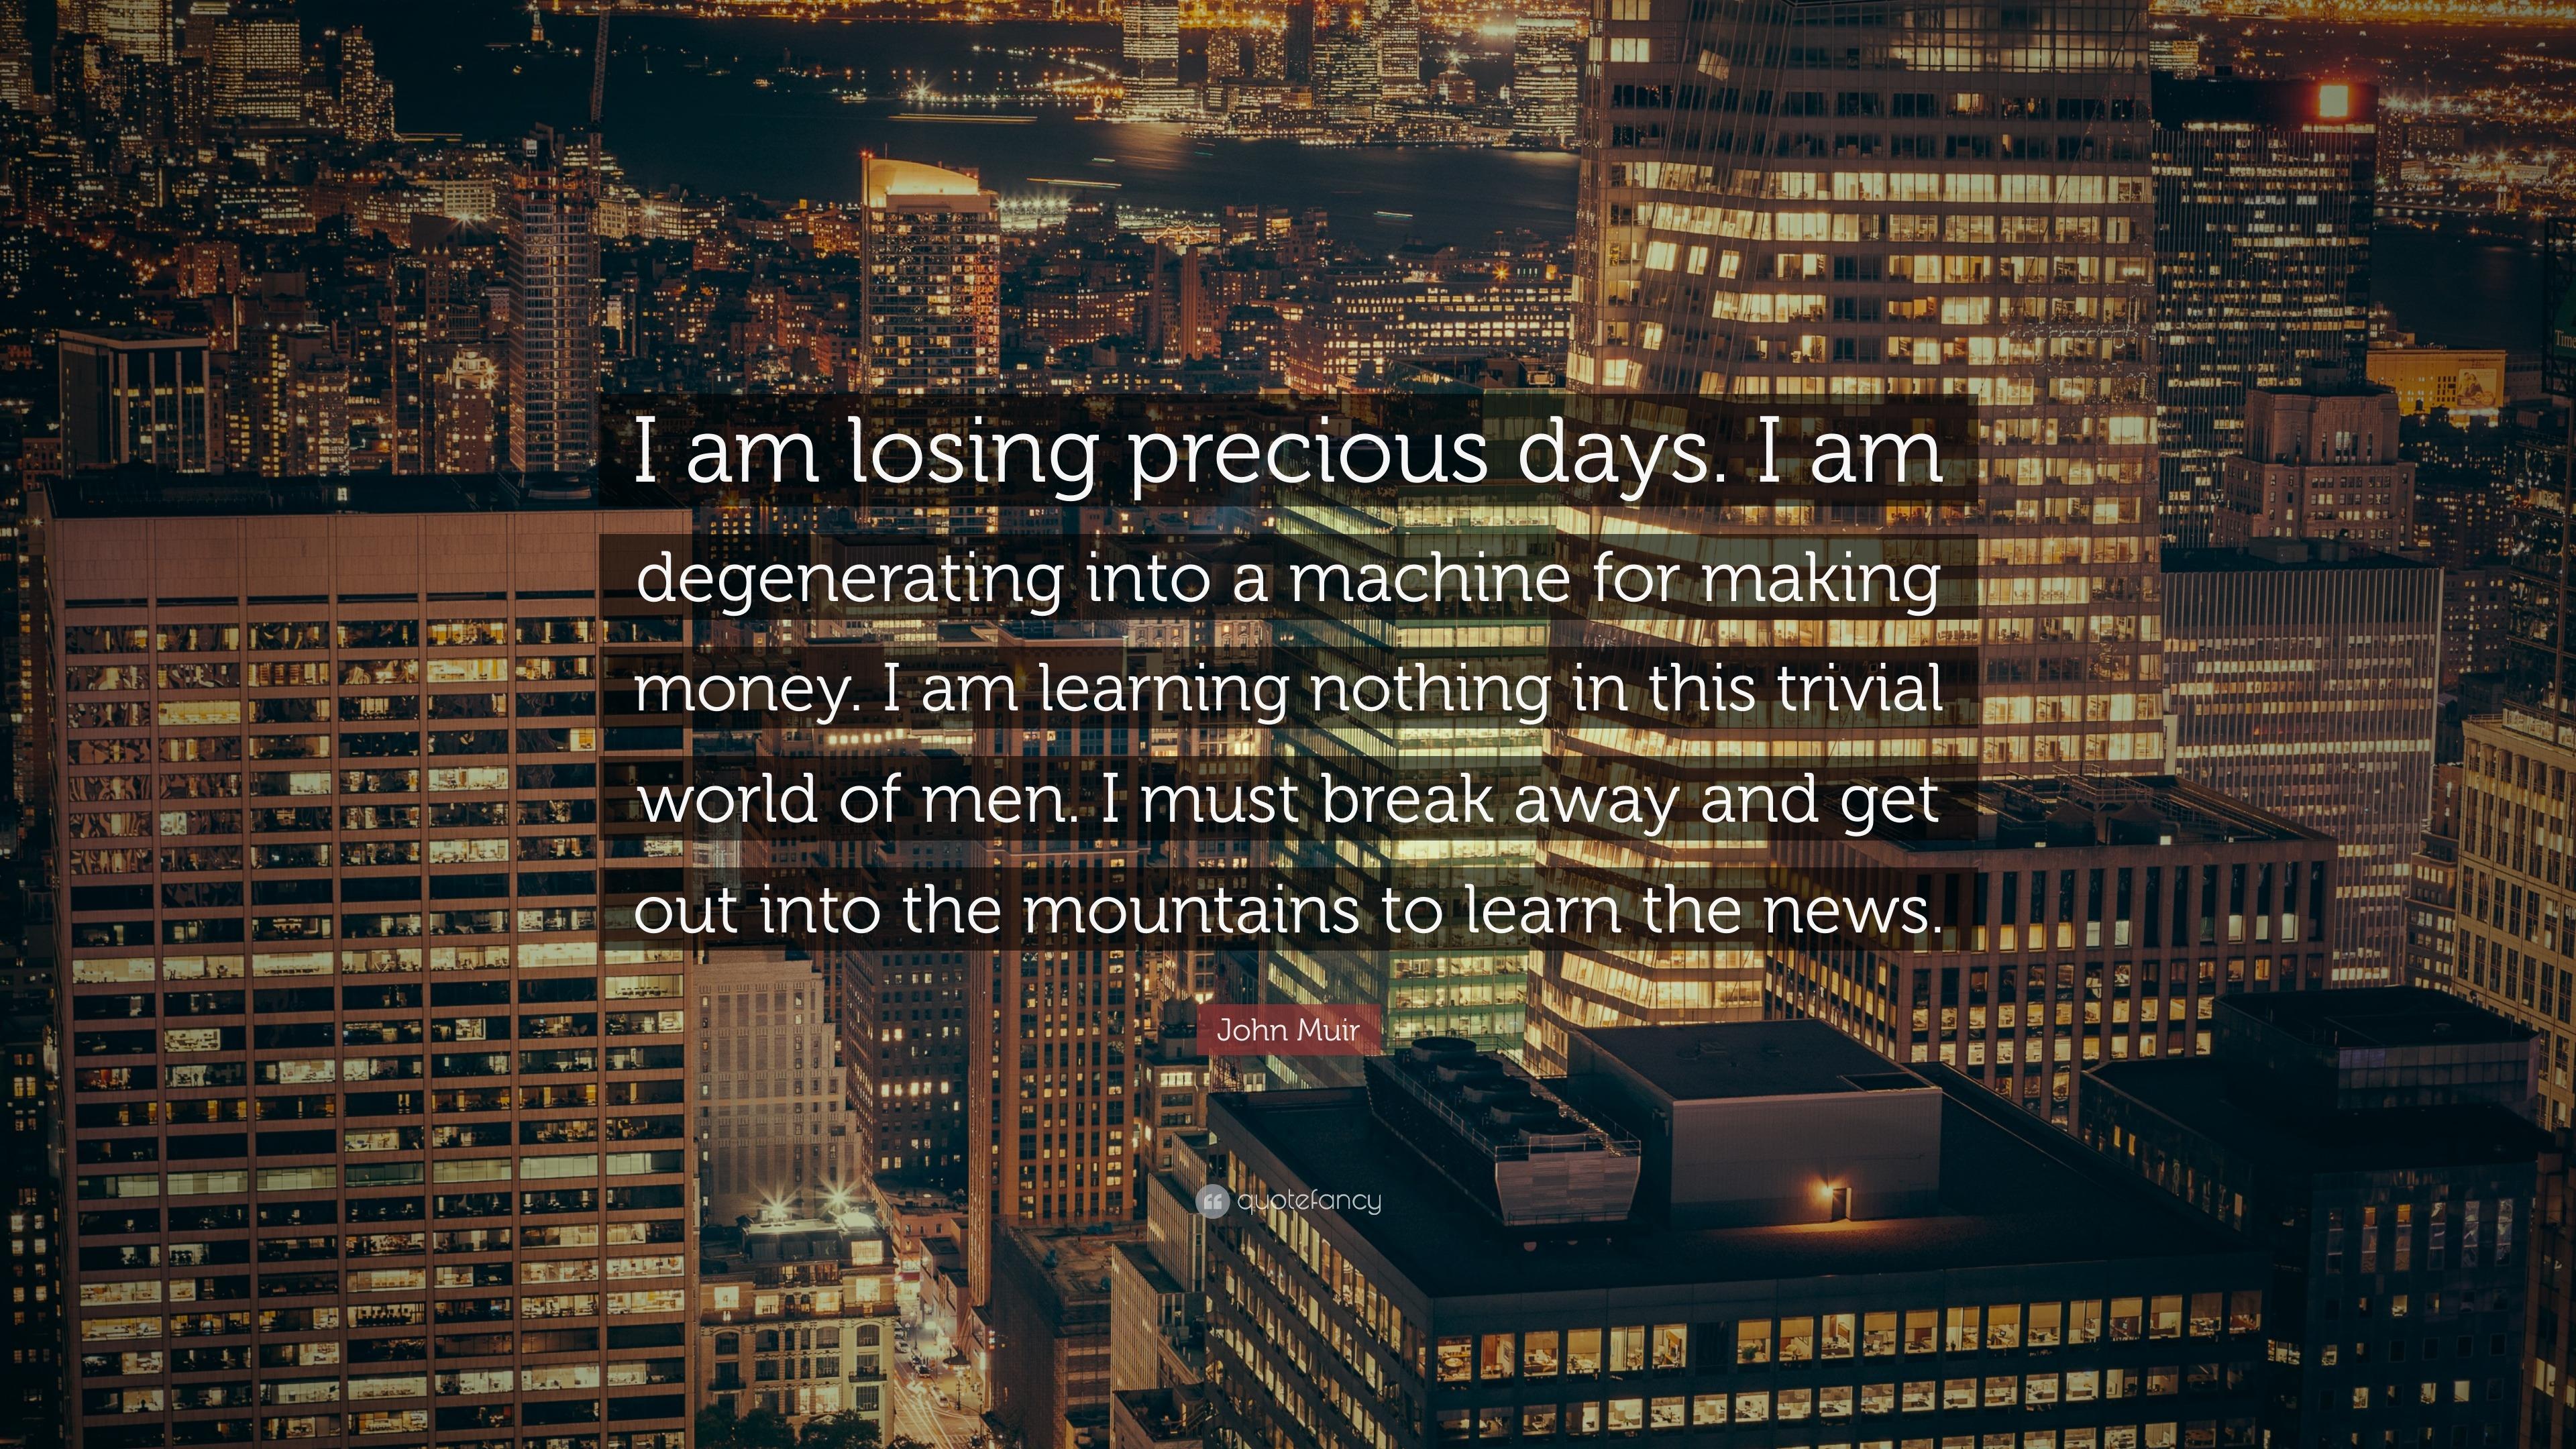 John Muir Quotes Wallpaper John Muir Quote I Am Losing Precious Days I Am